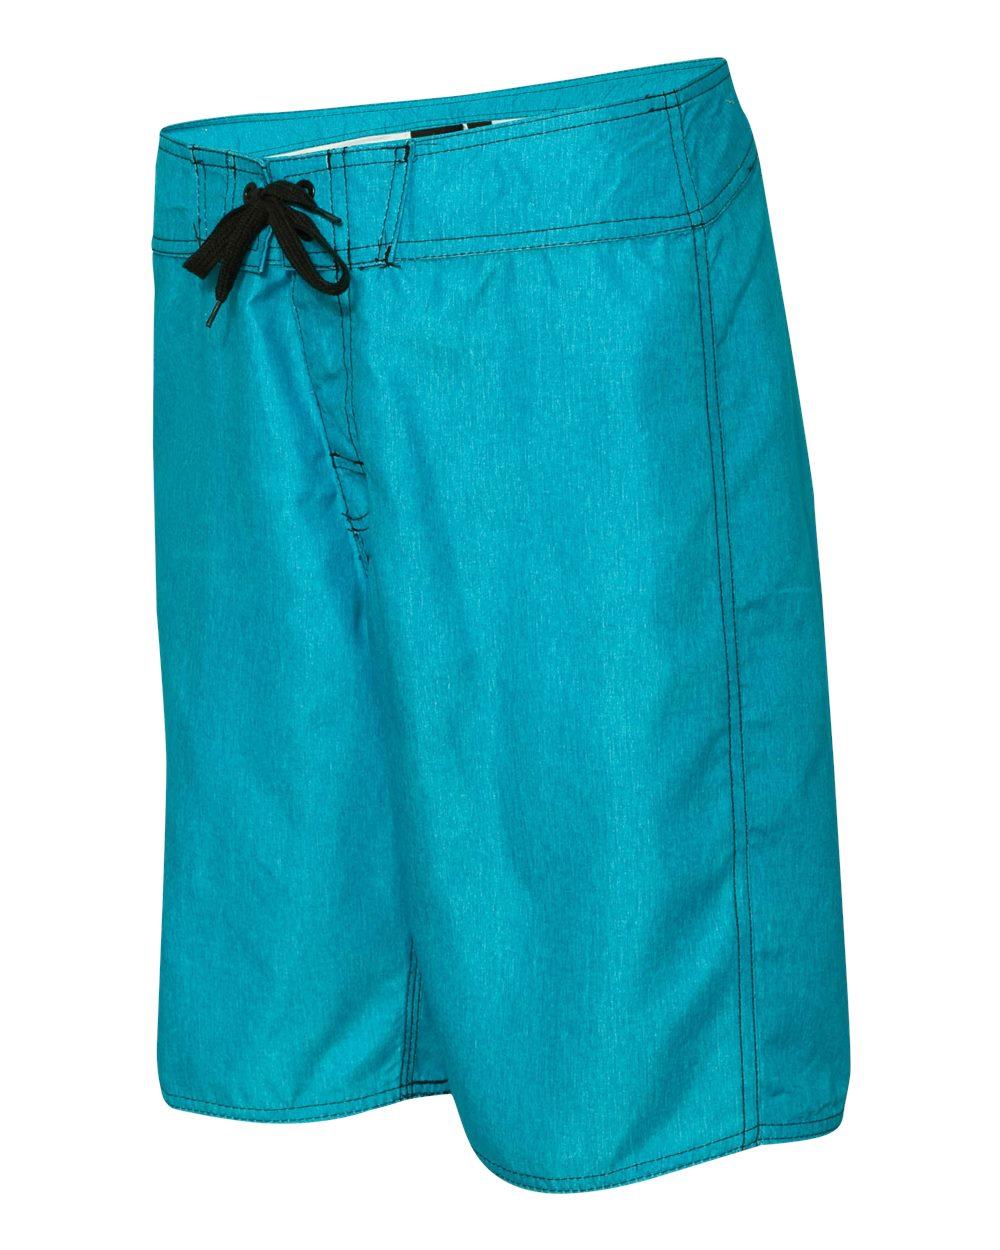 Burnside-Men-039-s-Heathered-Board-Shorts-B9305-30-40 thumbnail 3